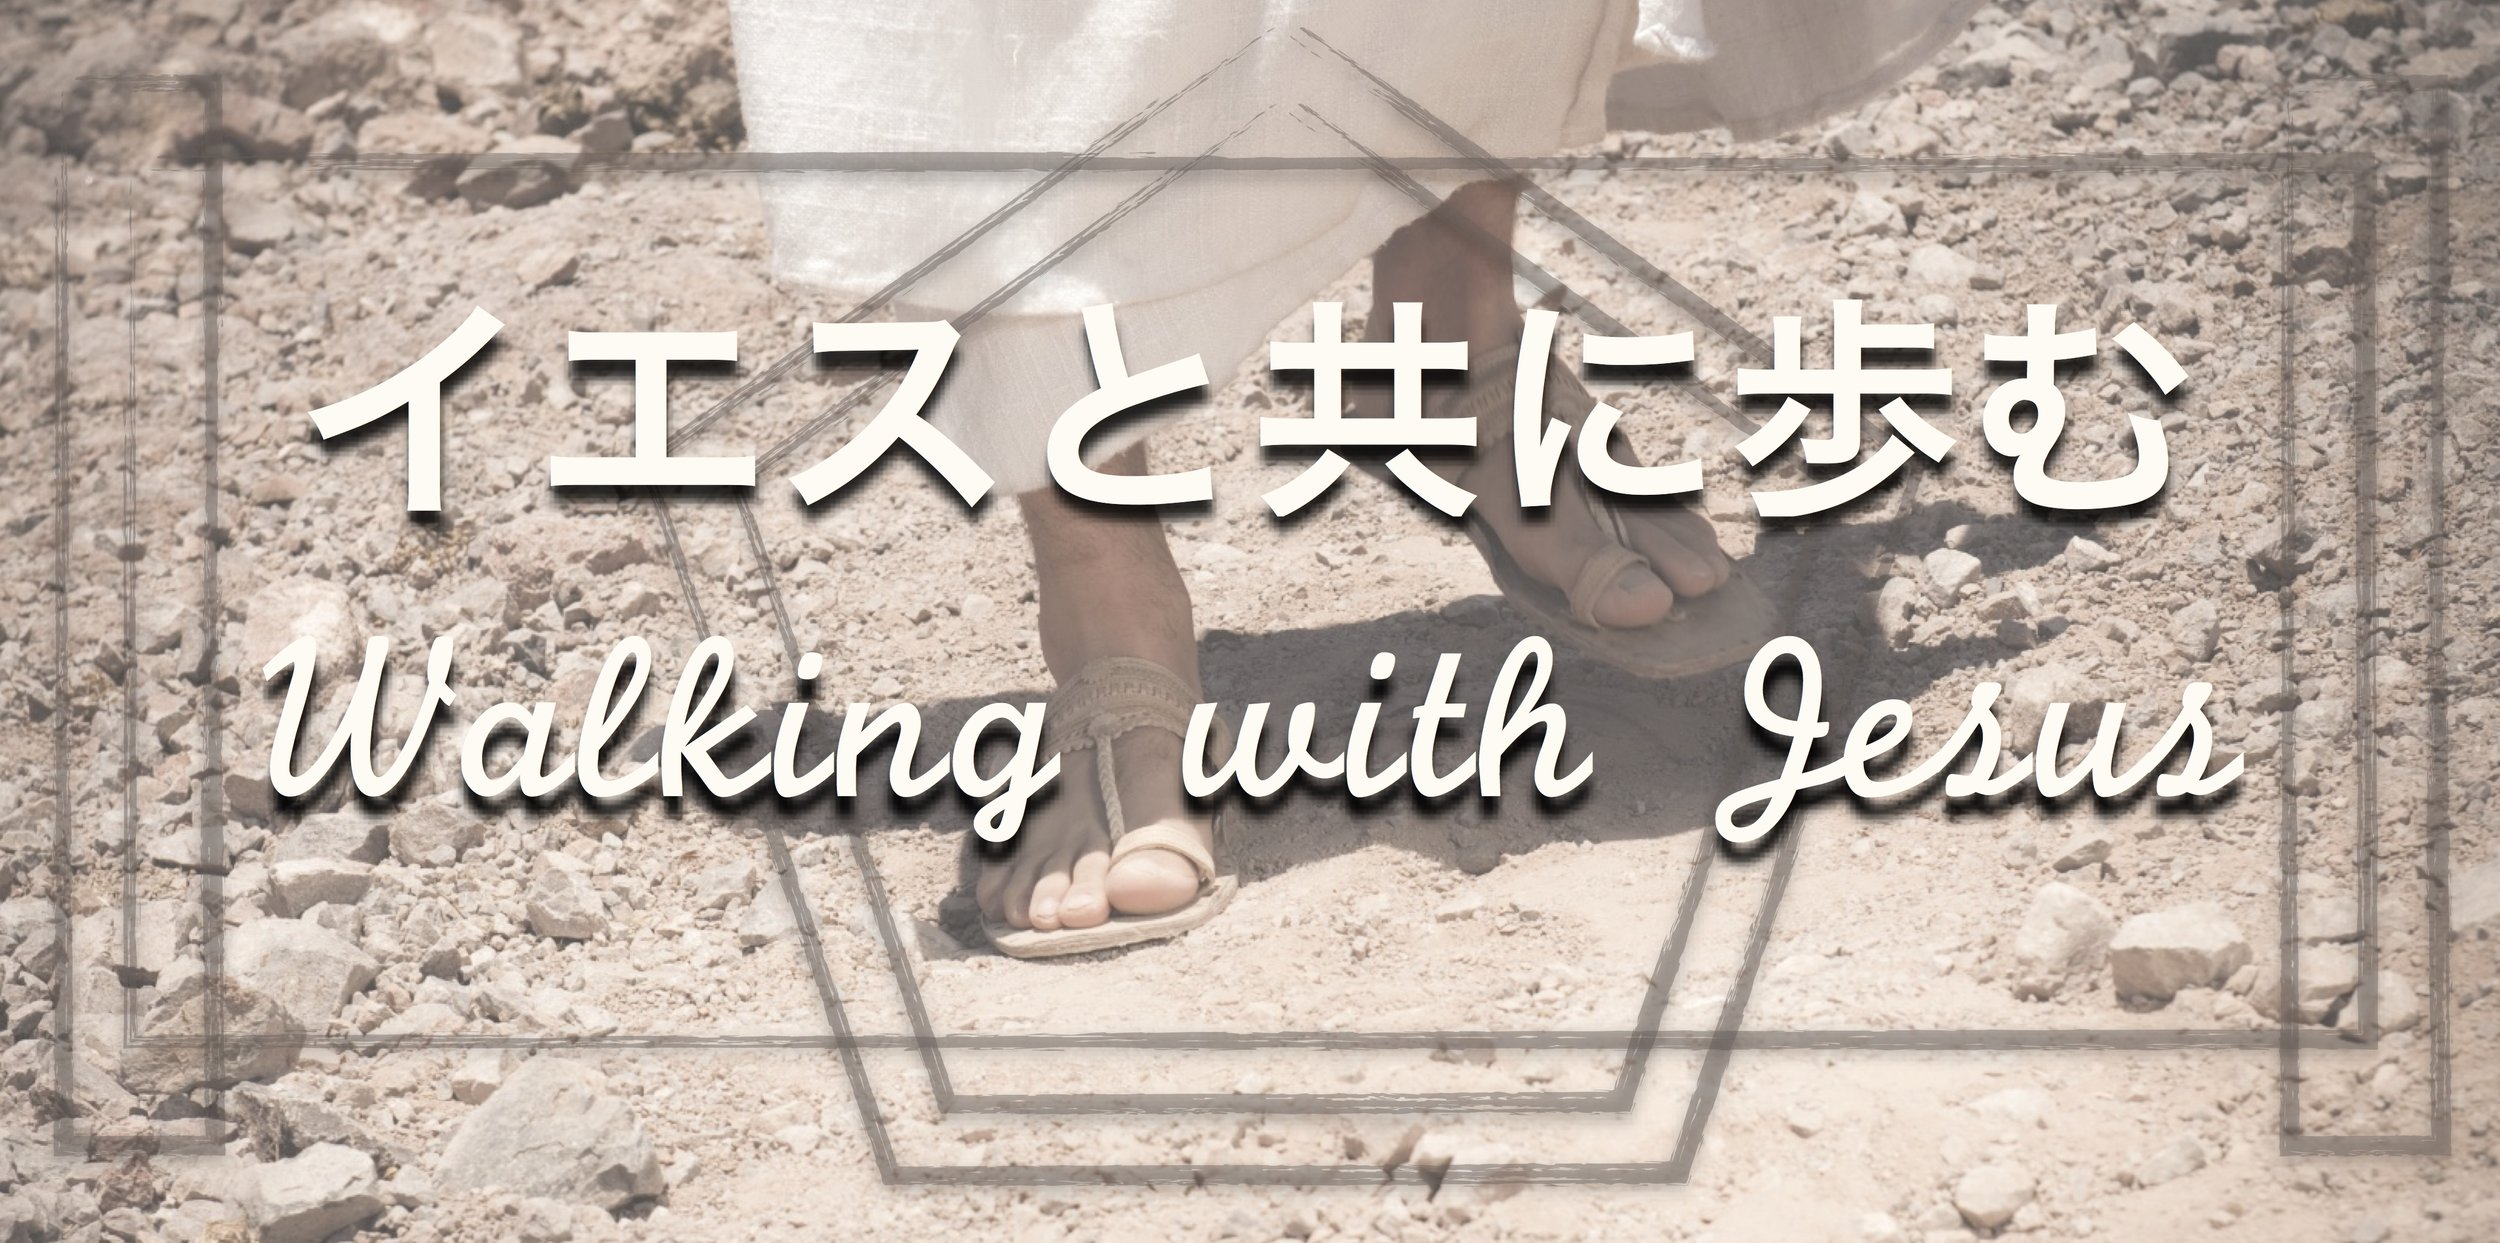 Walking with Jesus Banner Size JPEG.jpg